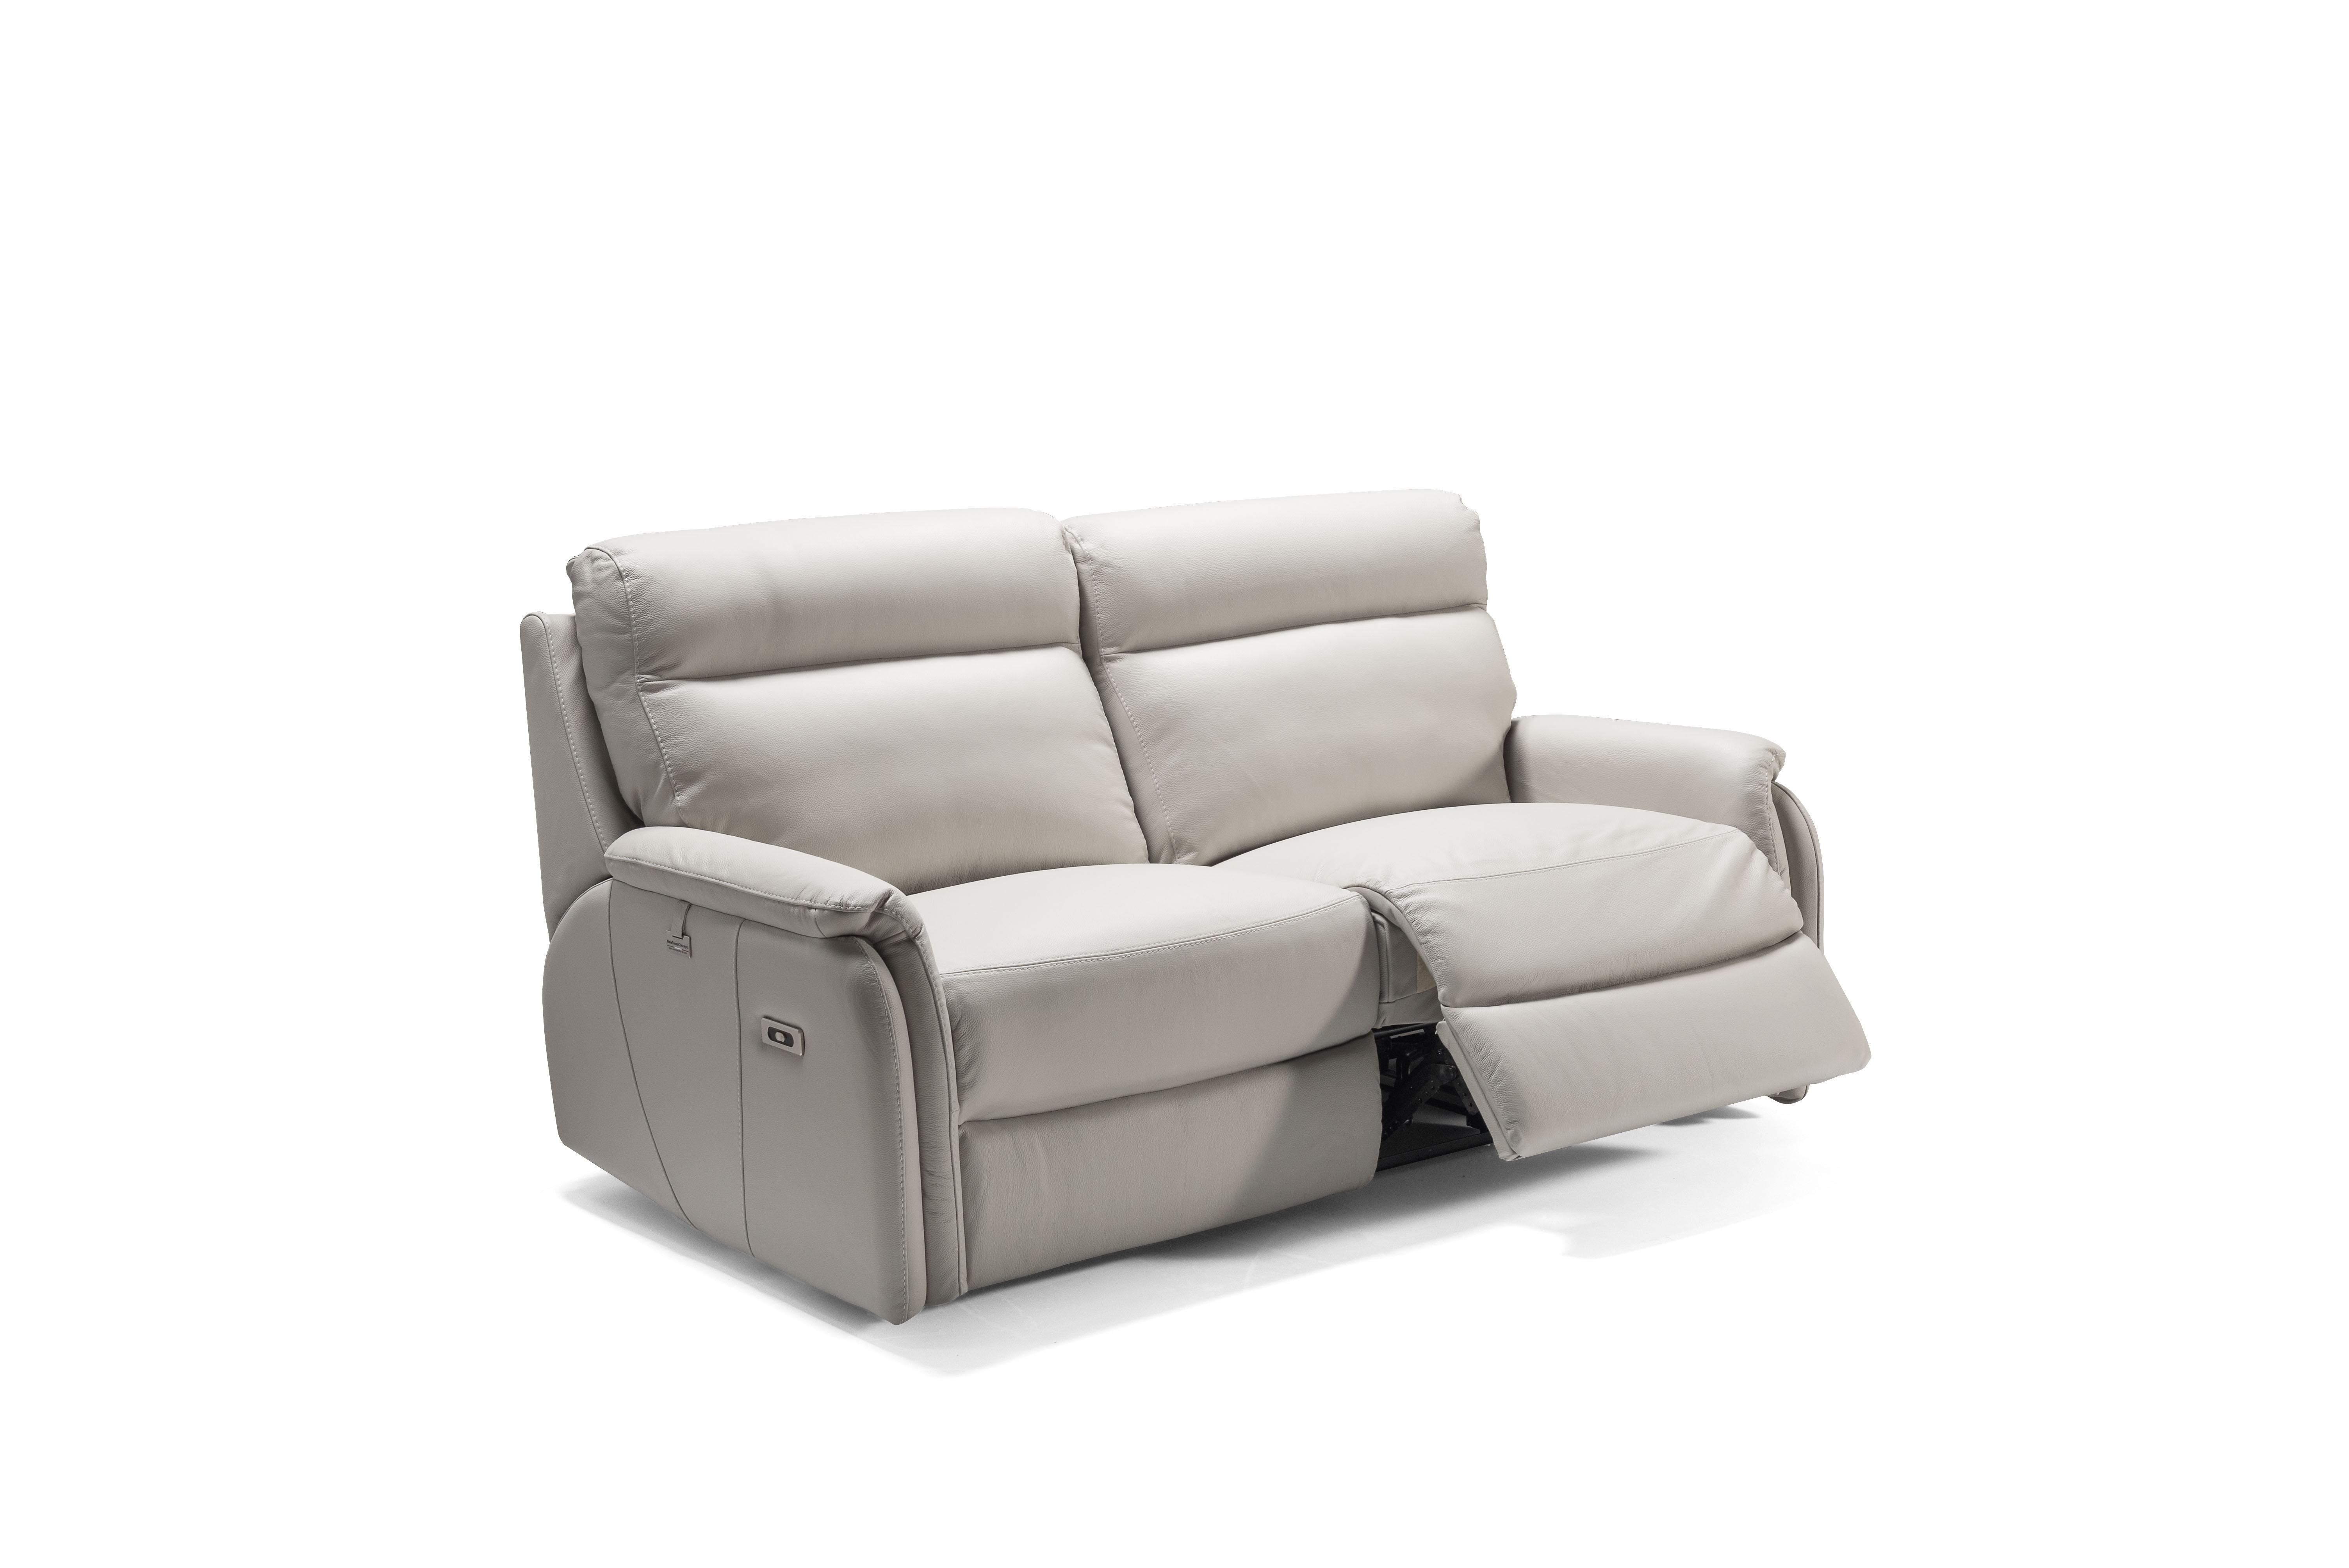 FOX Italian Leather Recliner 3 & 2 Seat Sofa by Galieri - Cenere Light Grey - Image 3 of 4